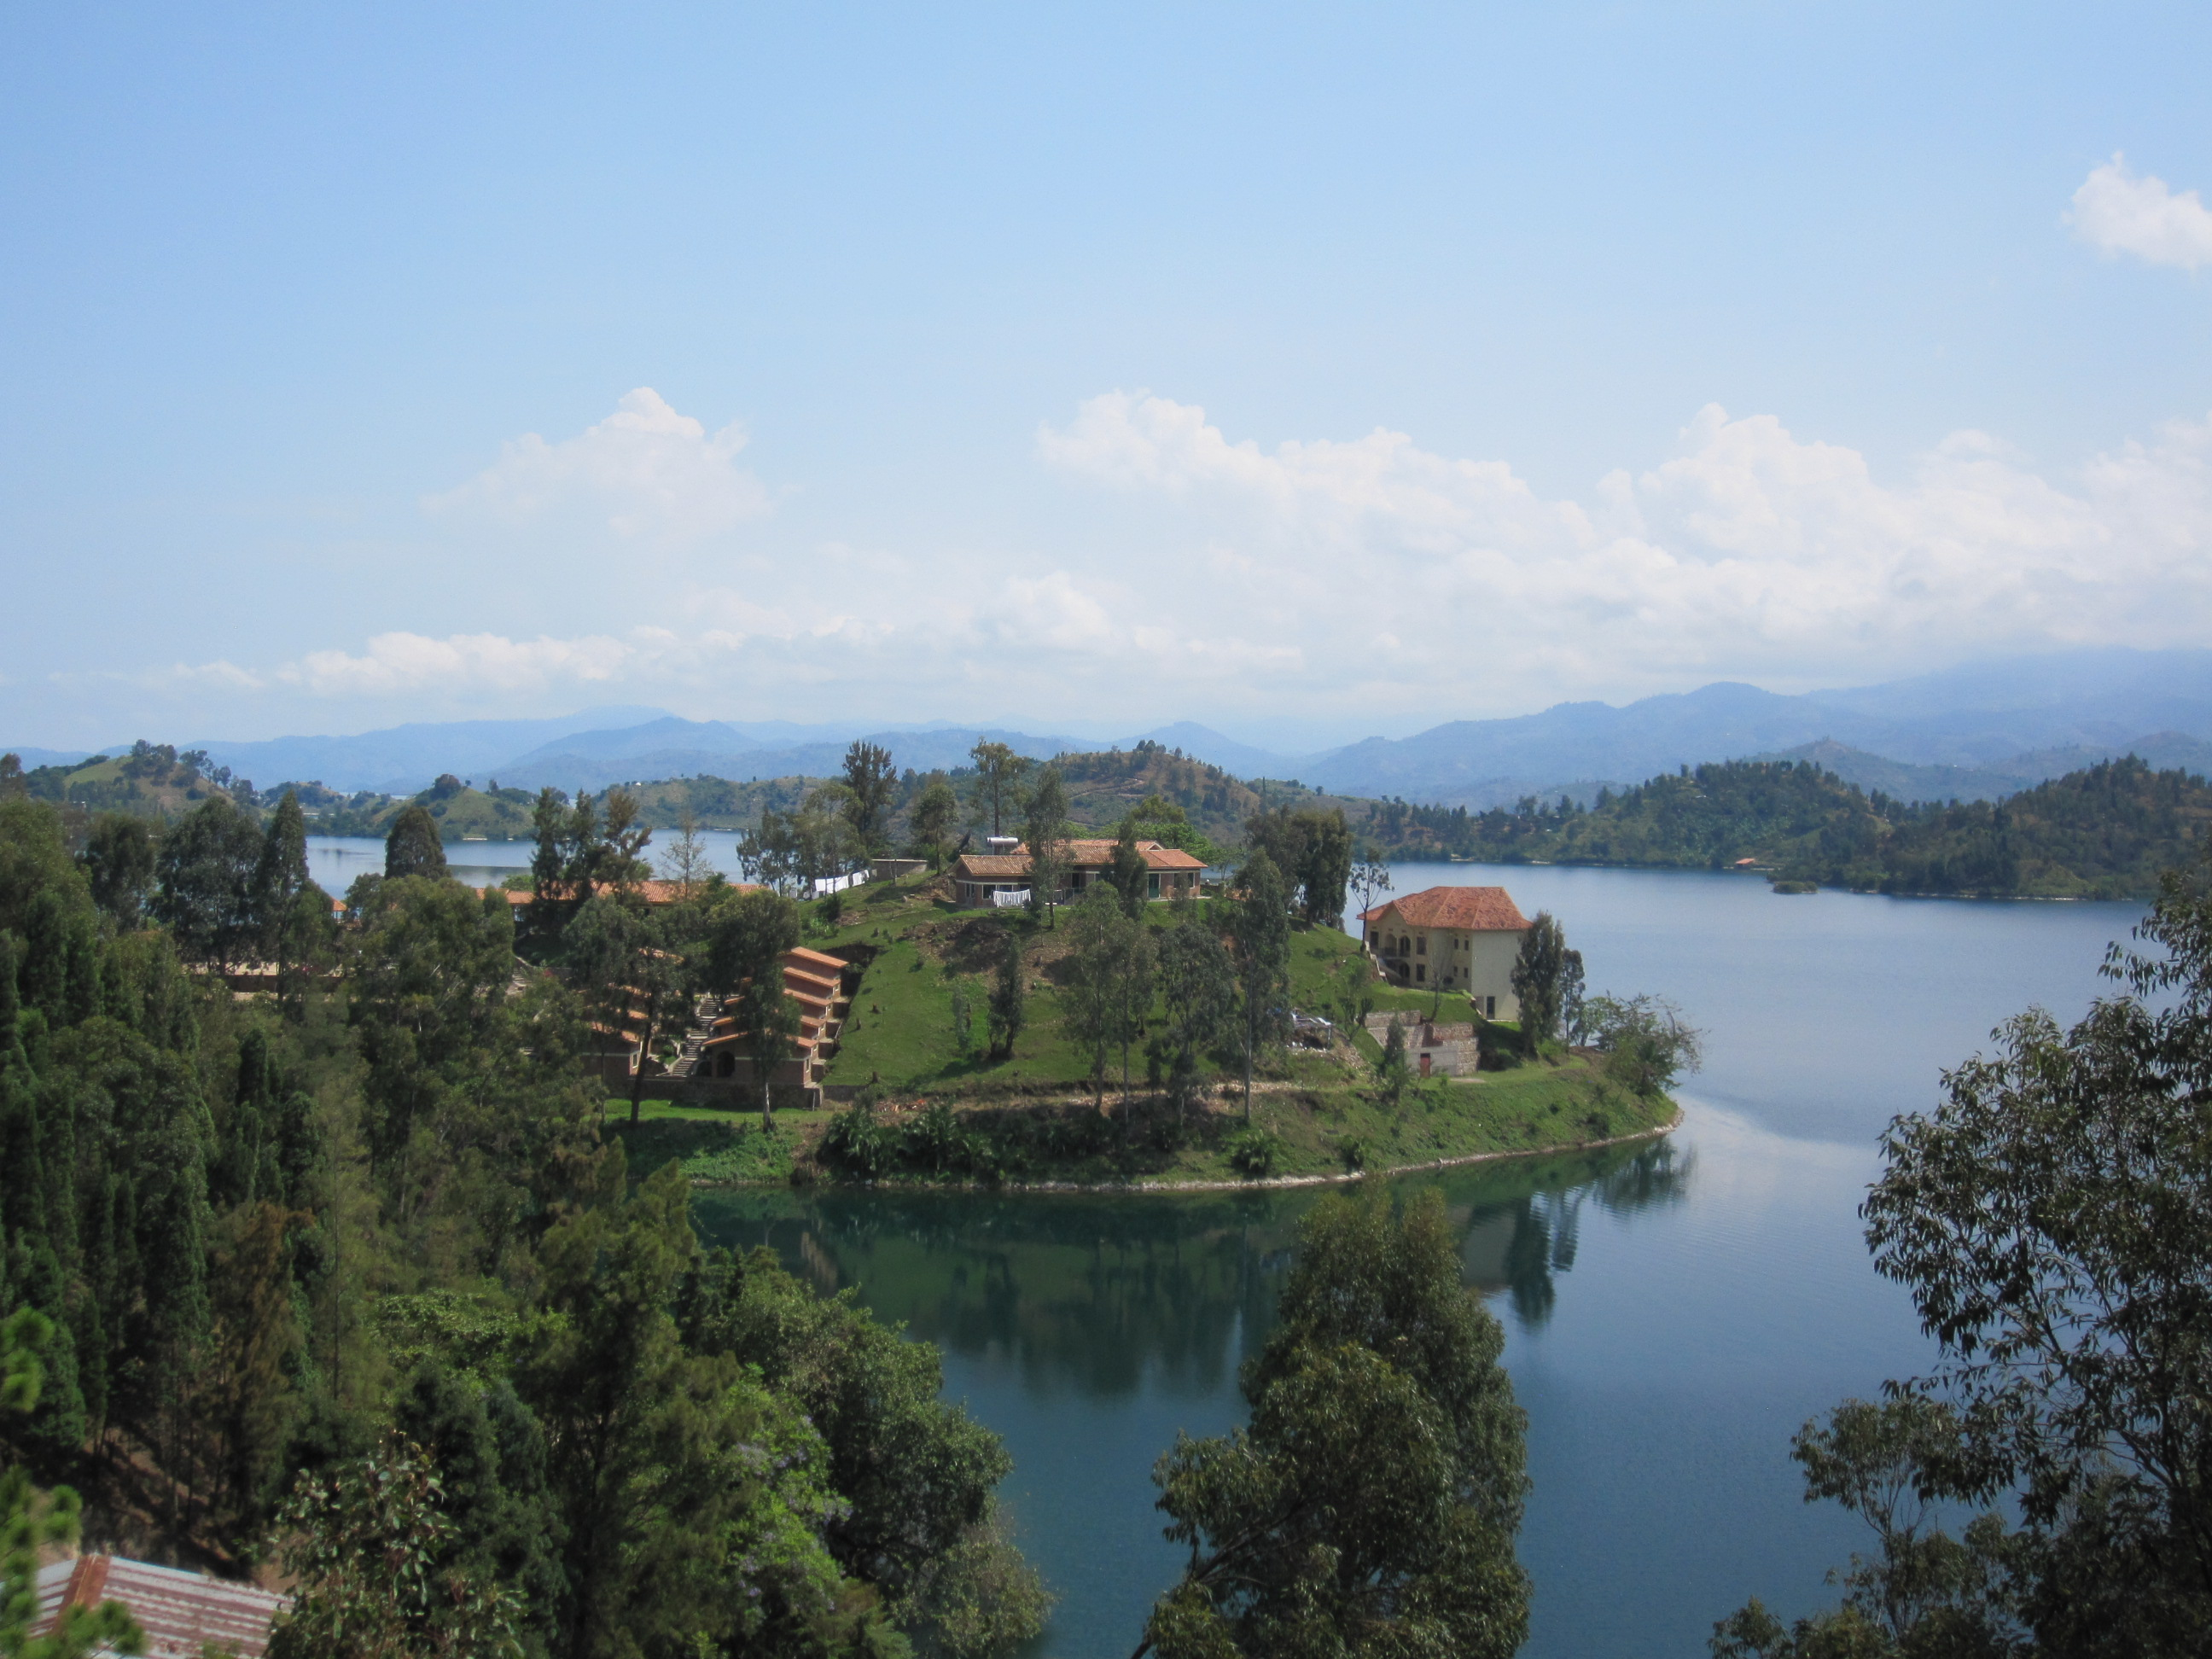 Hotel Bethanie, Kibuye, Lake Kivu